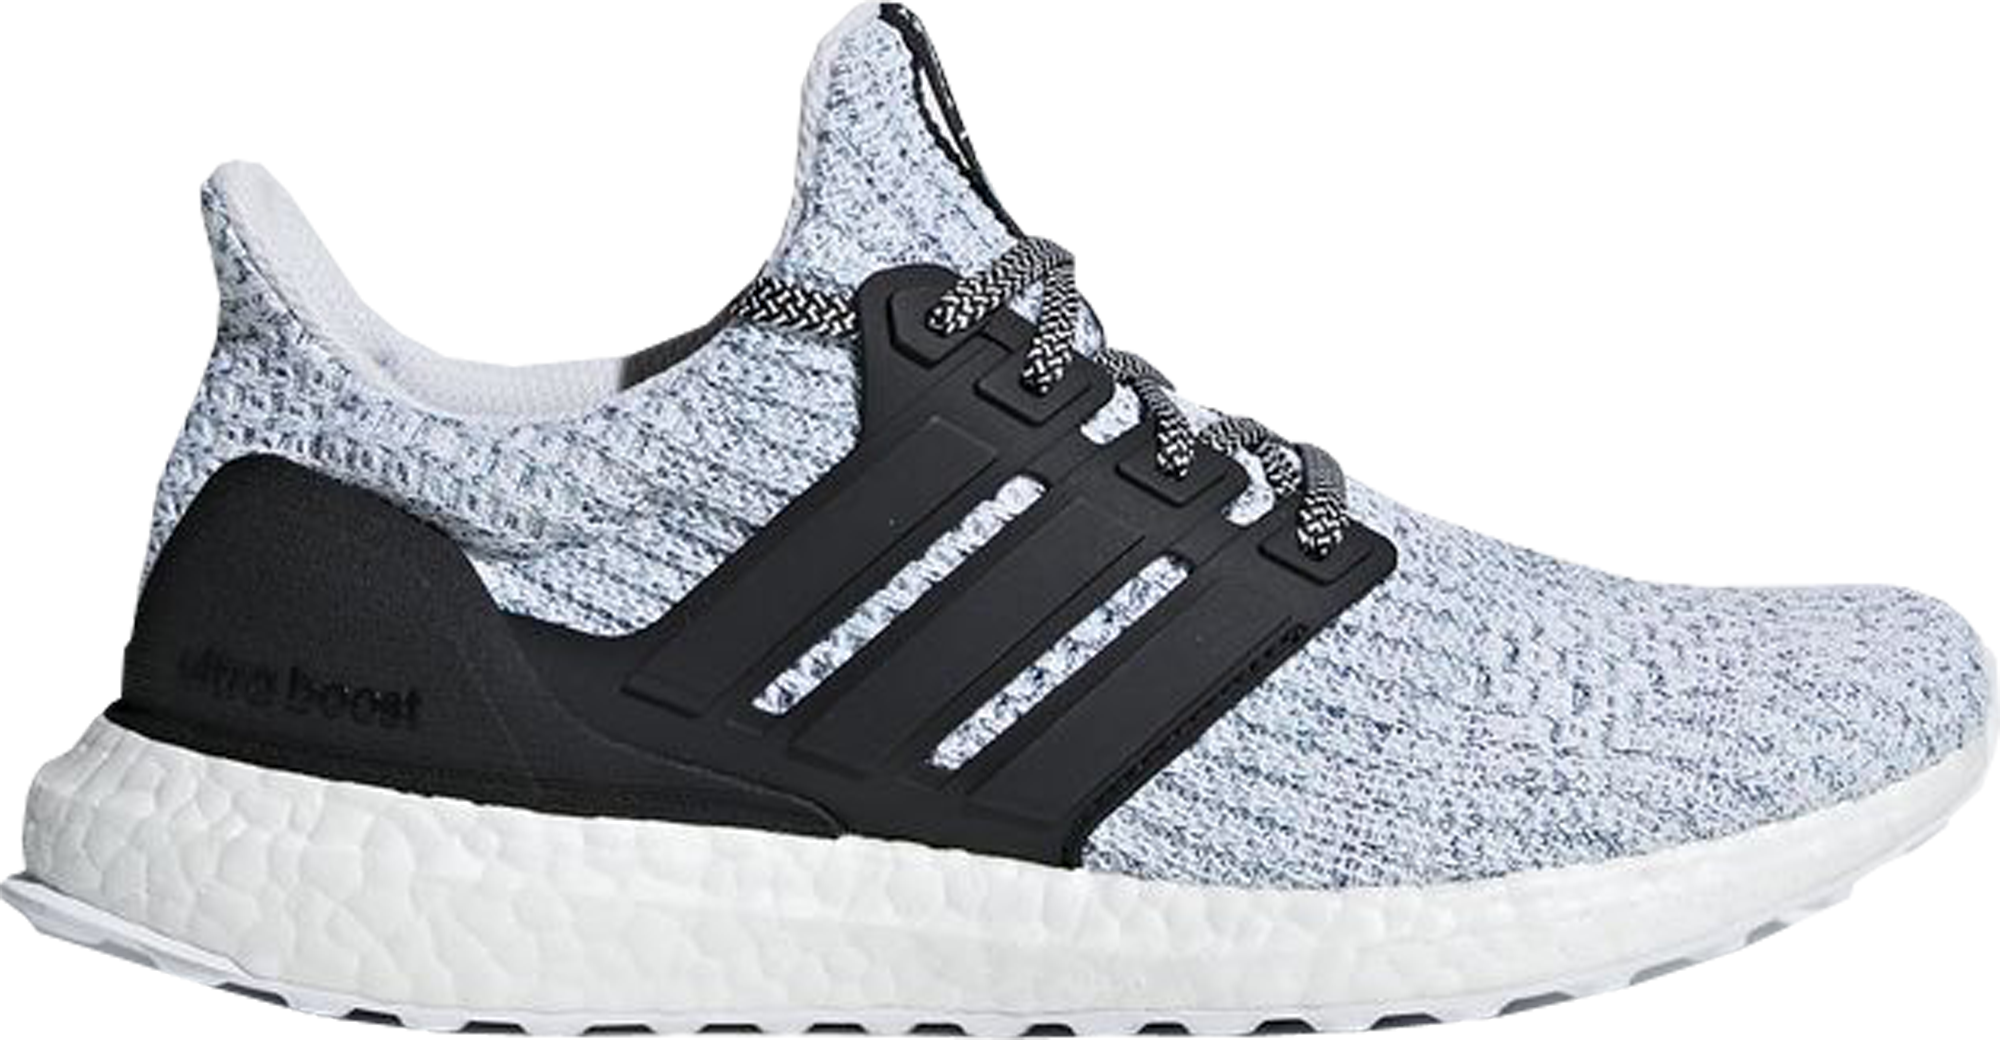 adidas Ultra Boost 4.0 Parley White Blue (W)